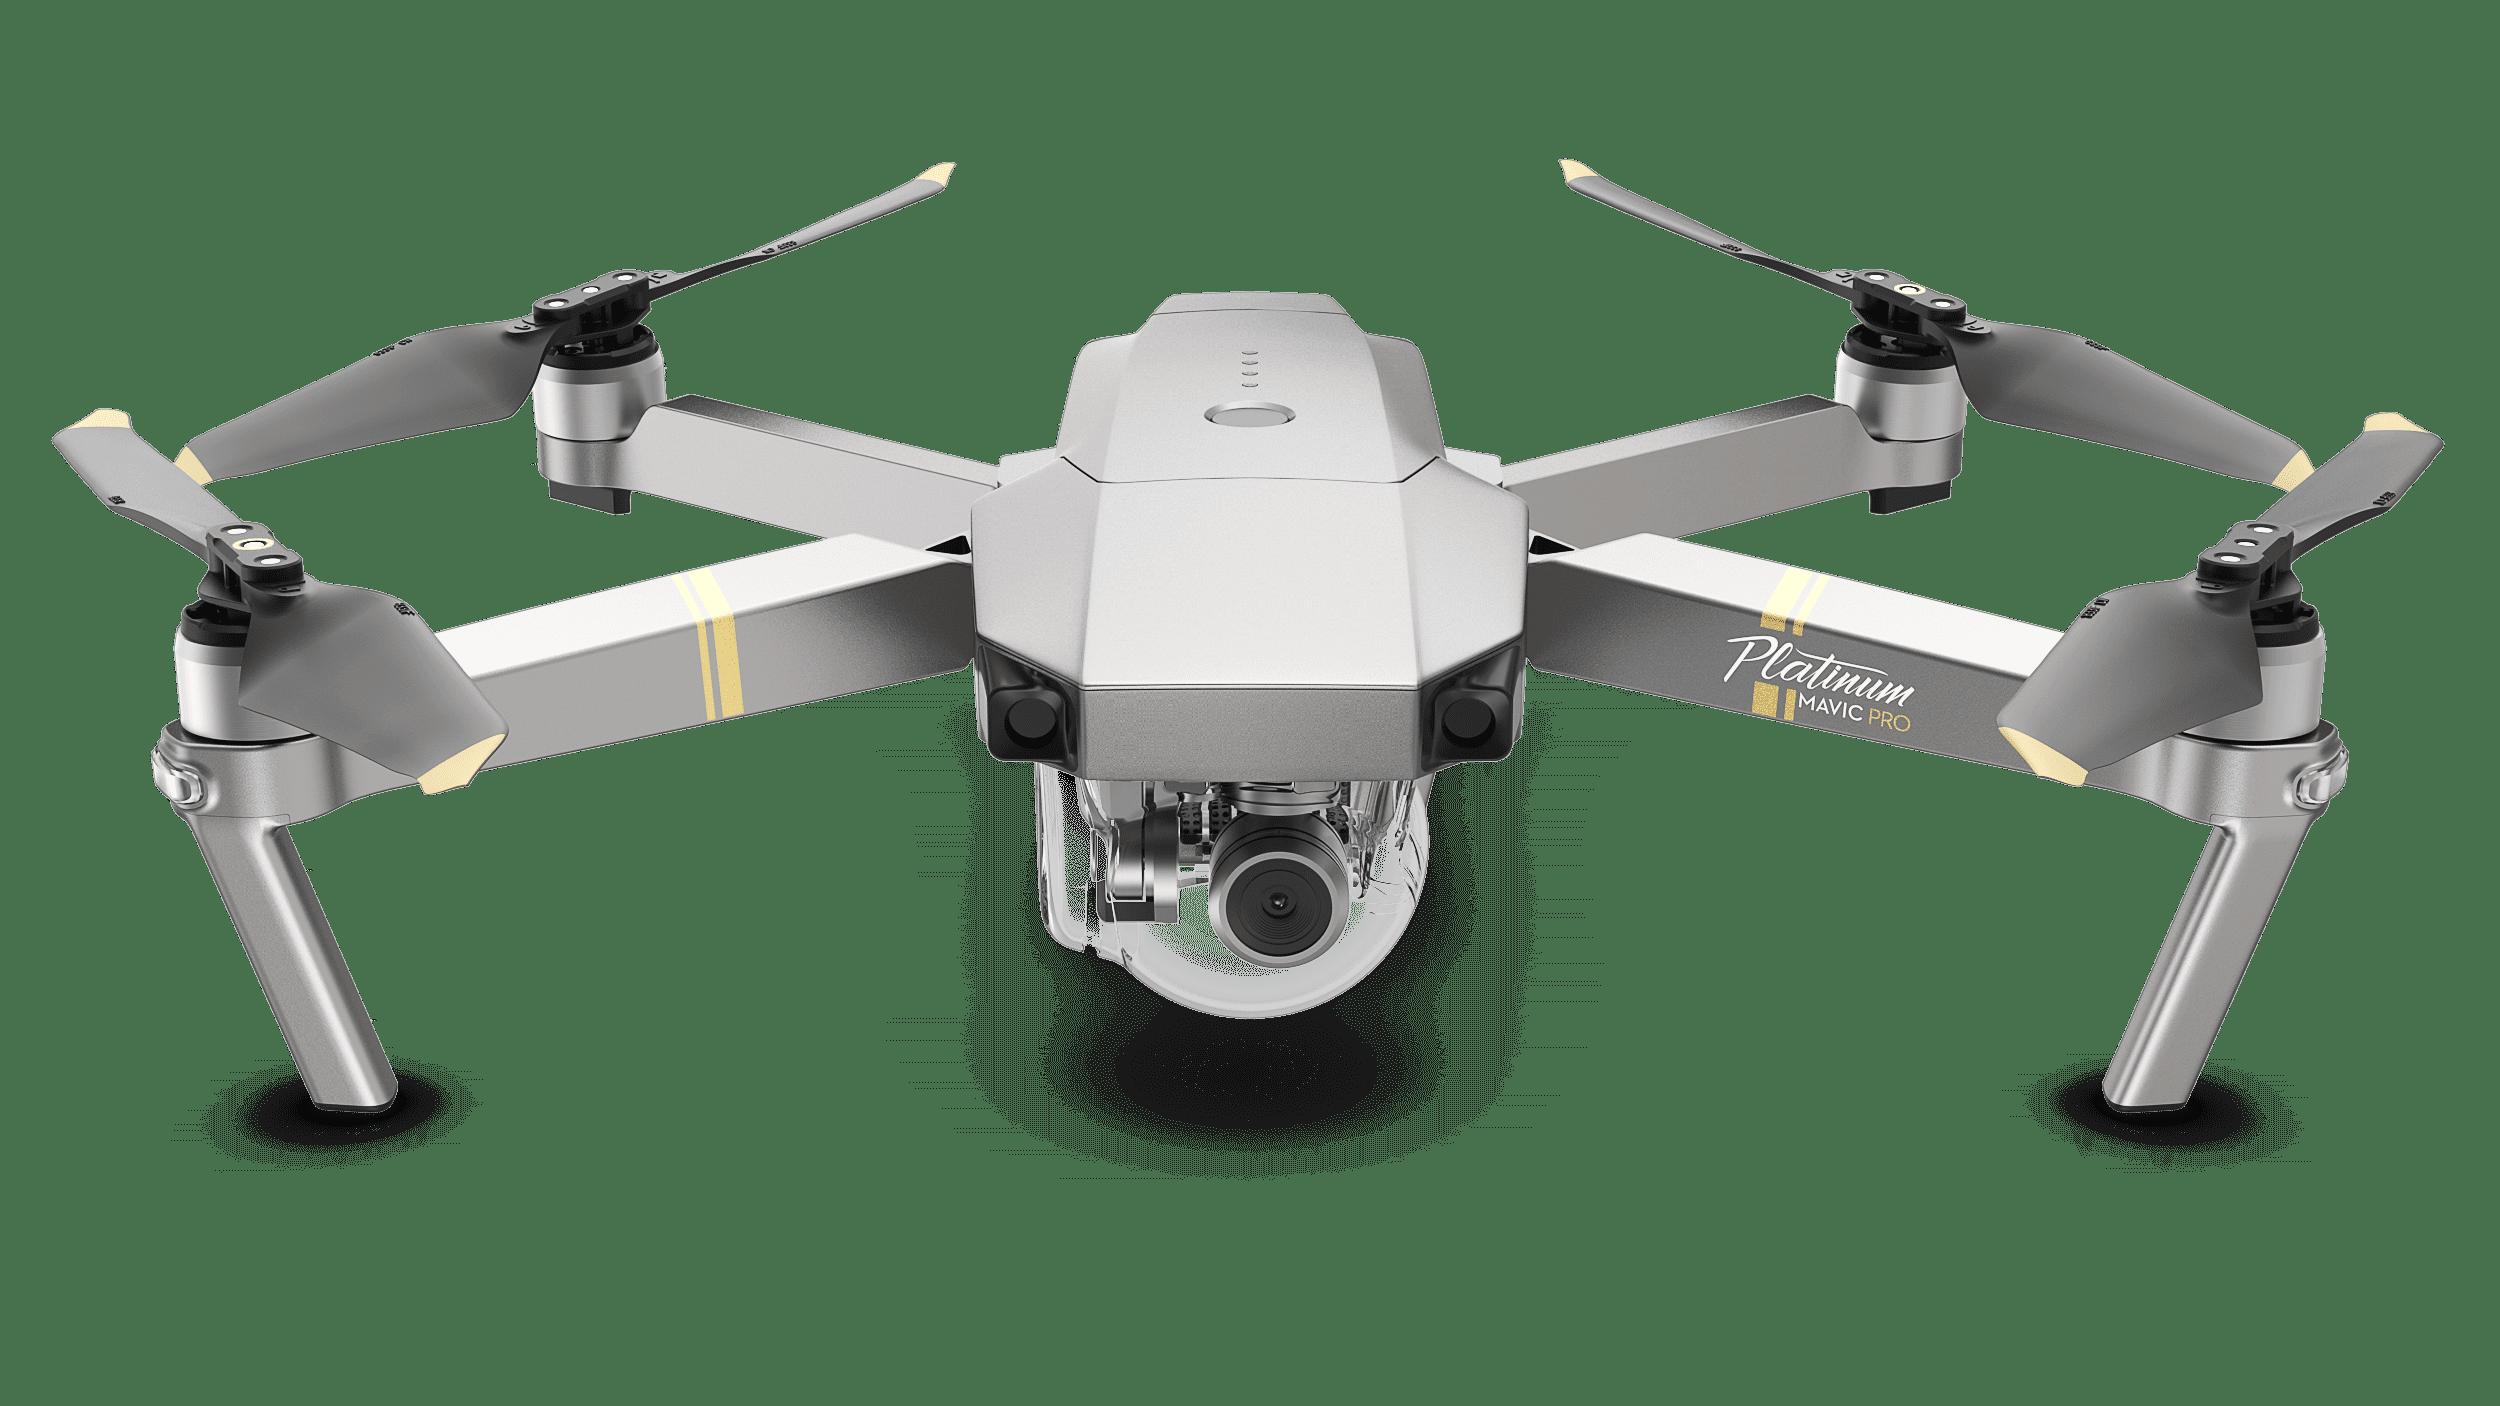 DJI Mavic Pro Platinum Drone by DJI